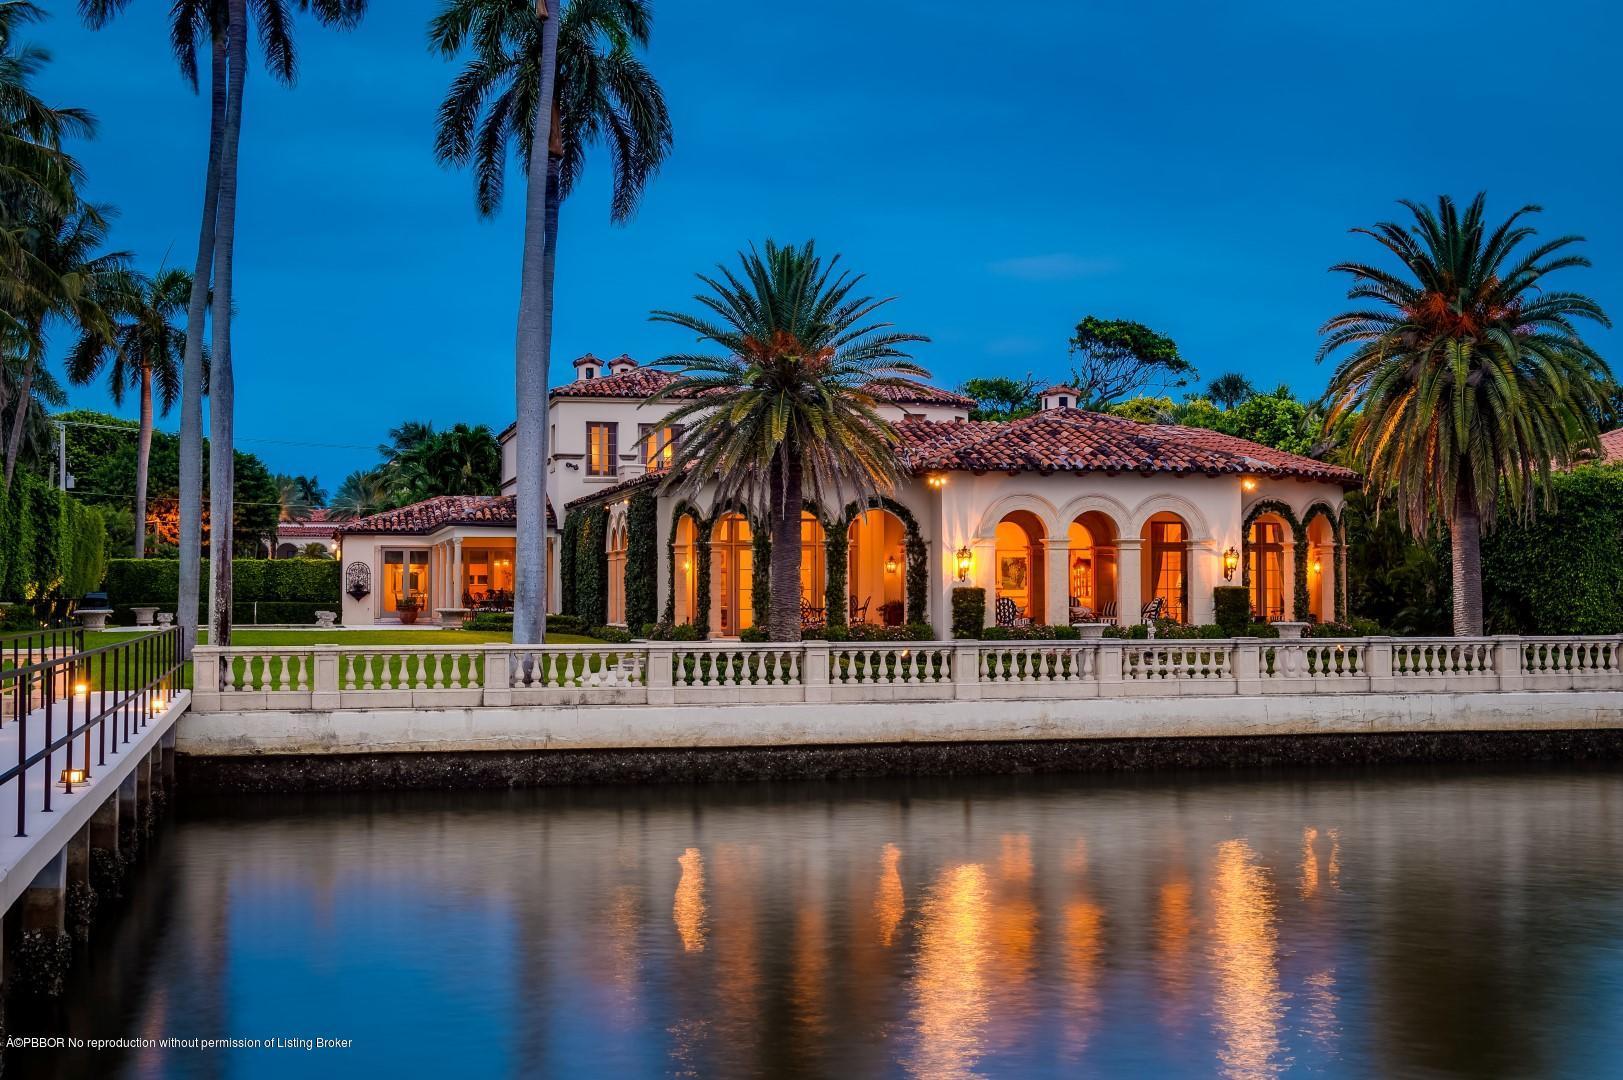 790 S County Road Palm Beach, FL 33480